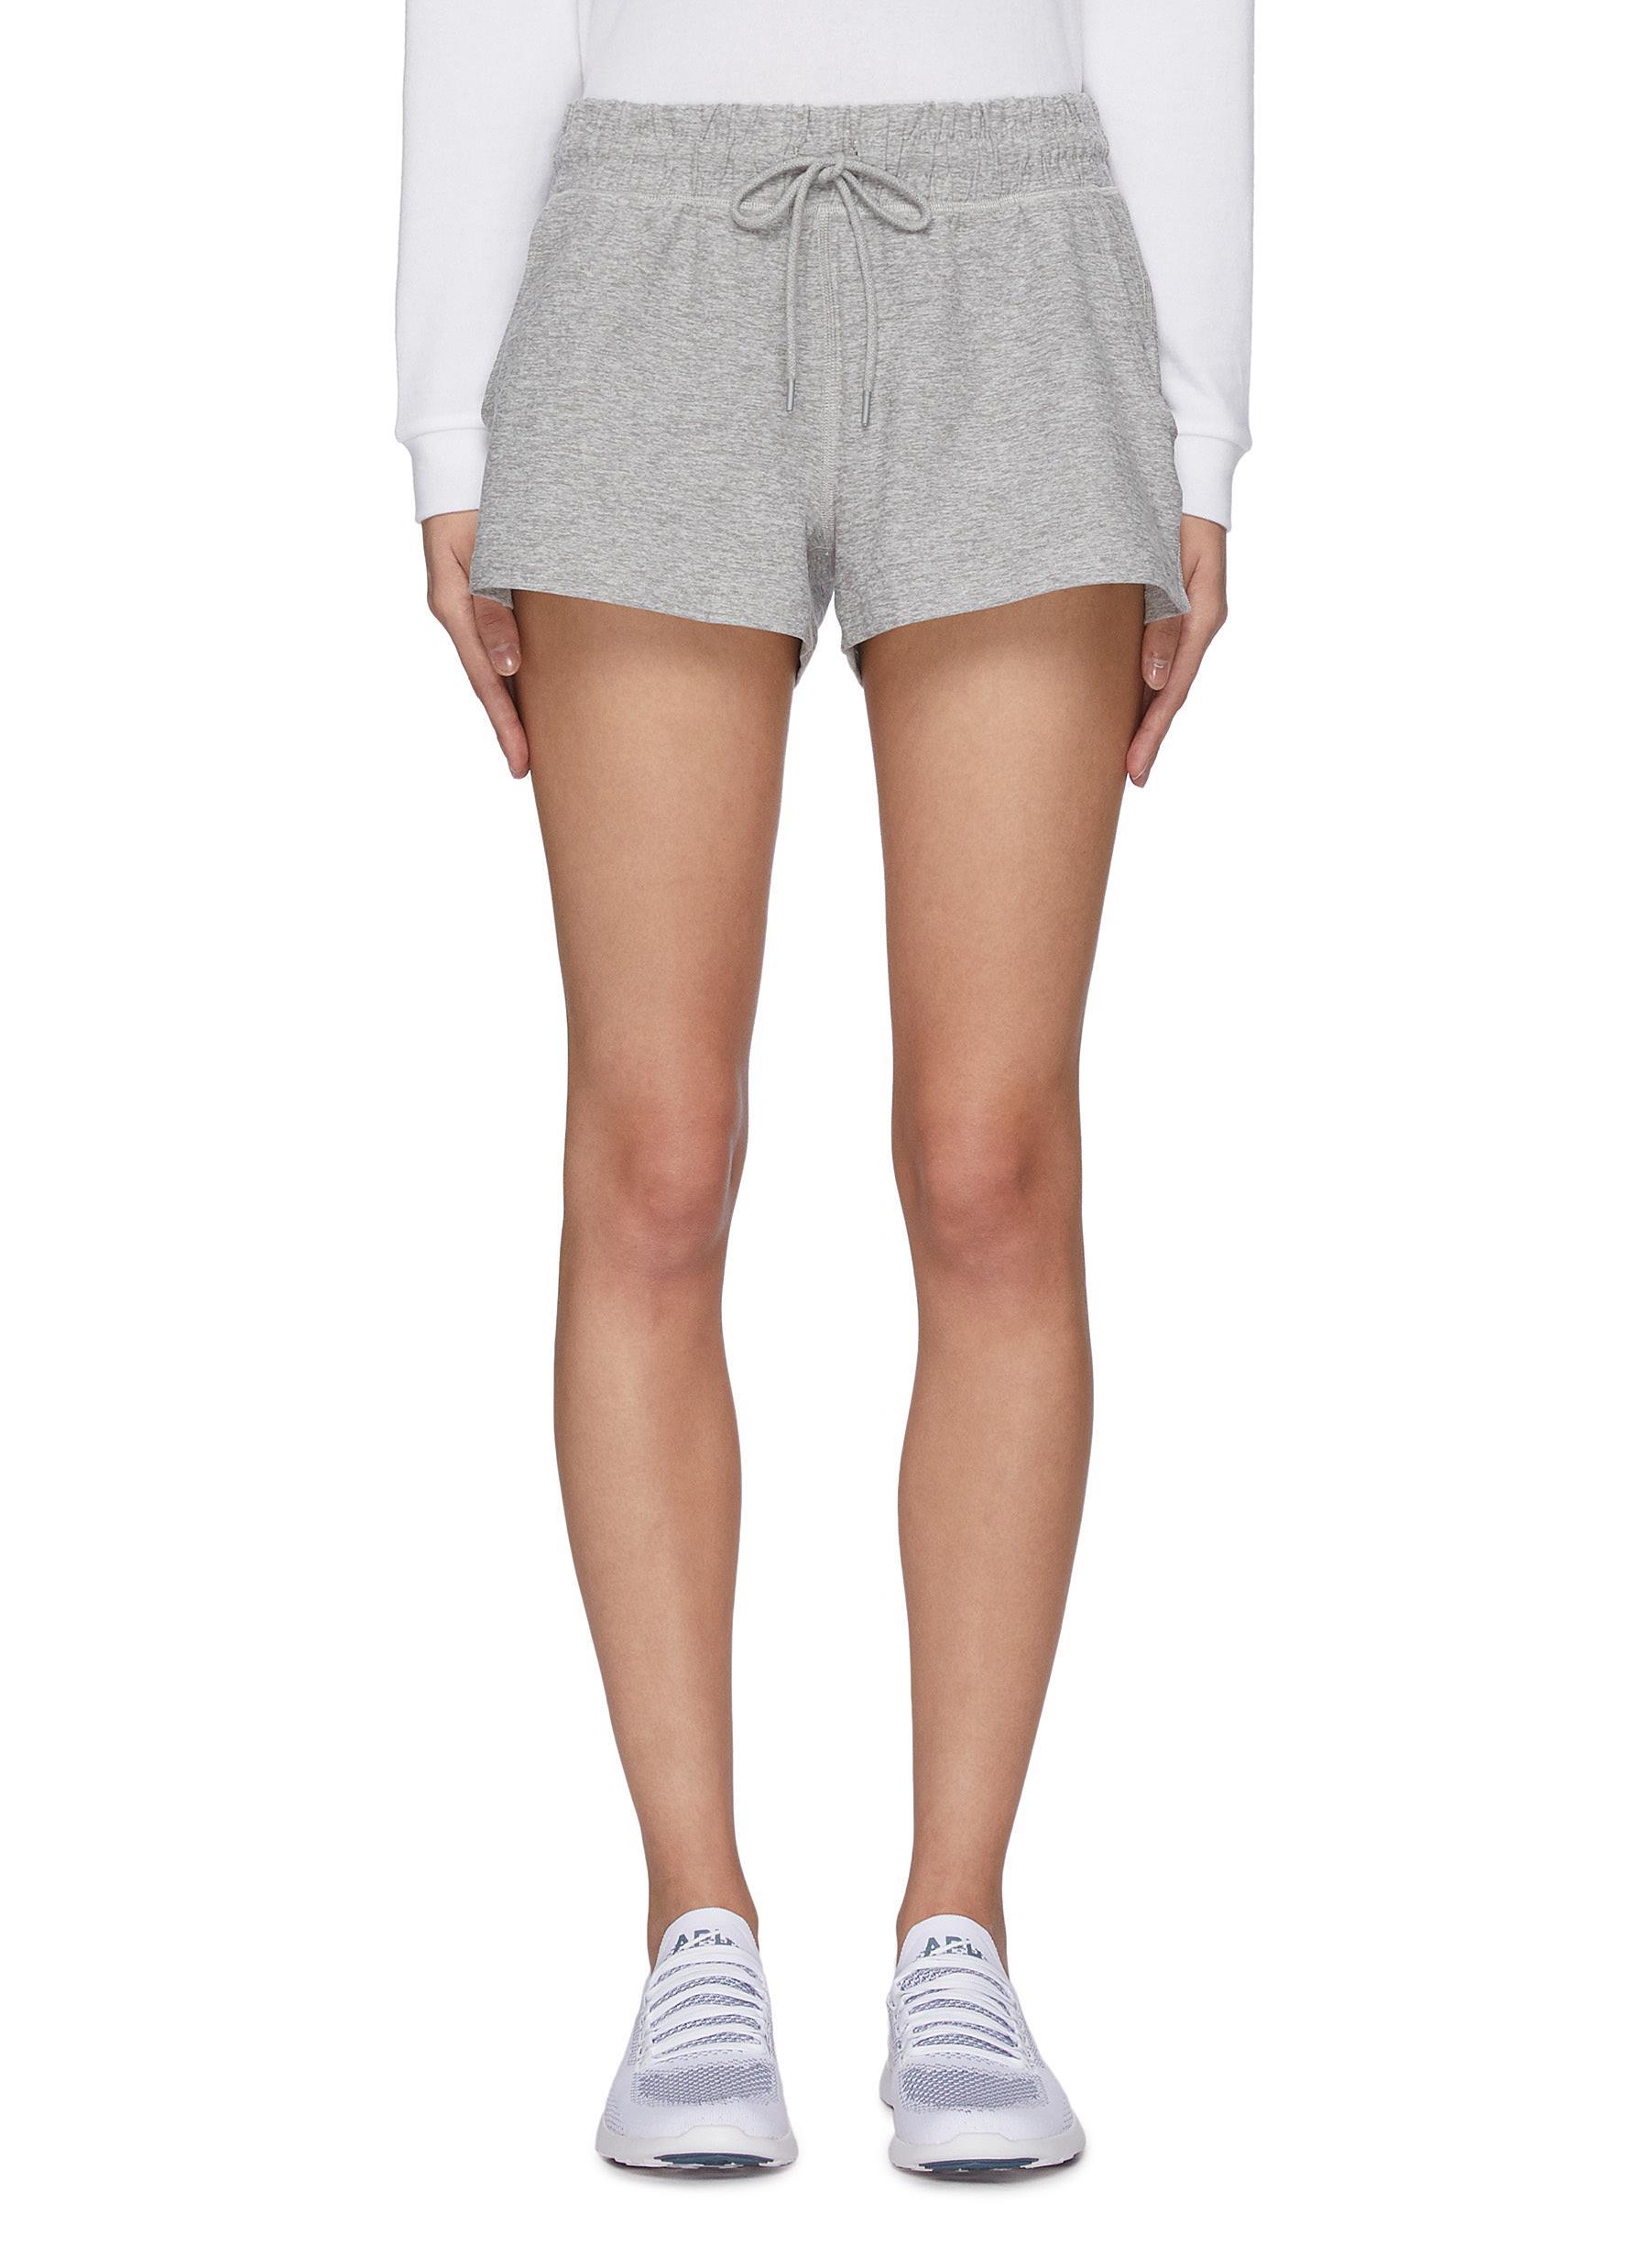 'Worked Up' Drawstring Waist Shorts